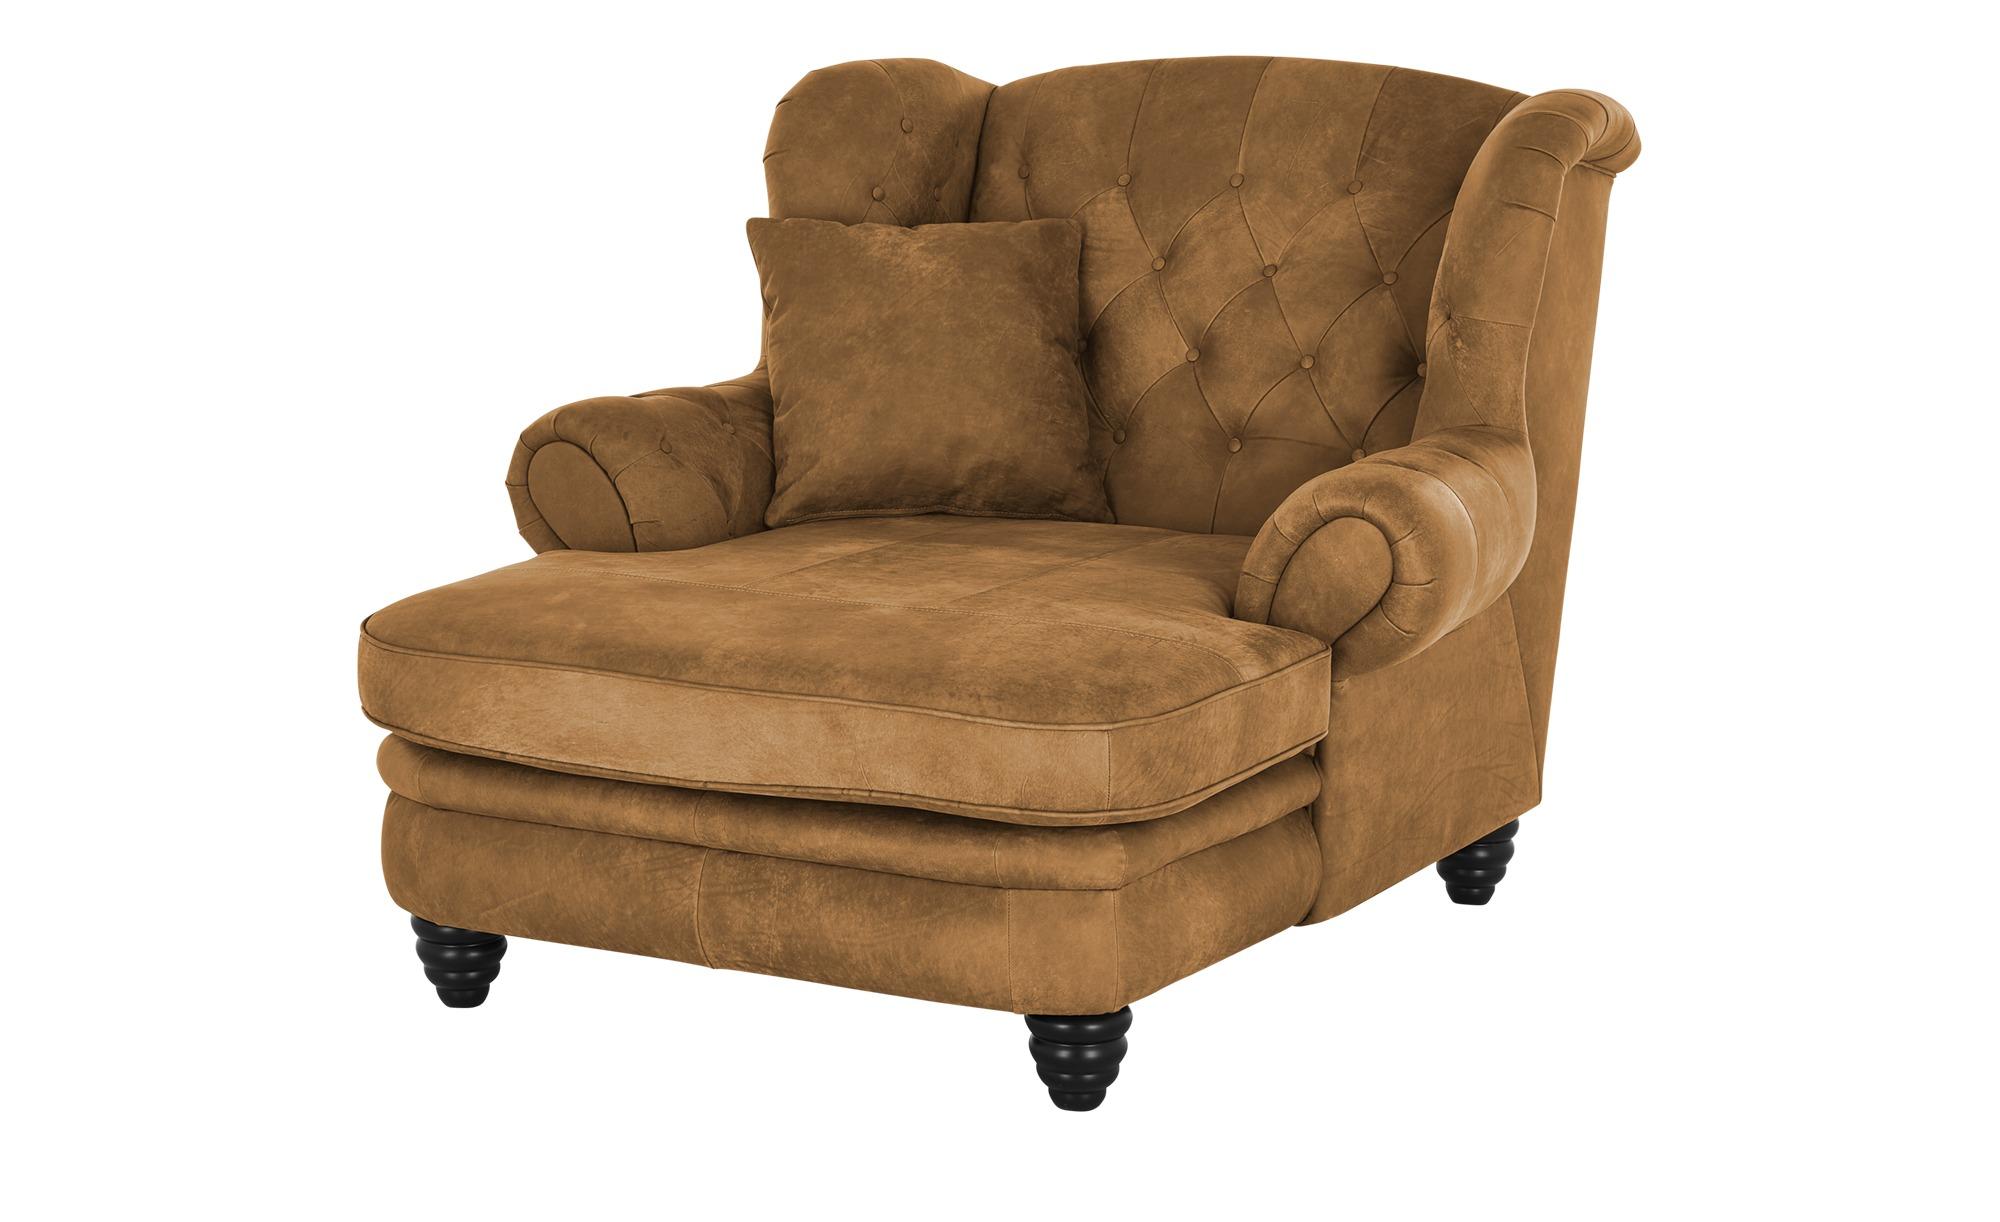 Ledersessel  Wales ¦ braun ¦ Maße (cm): B: 125 H: 104 T: 142 Polstermöbel > Sessel > Ohrensessel - Höffner